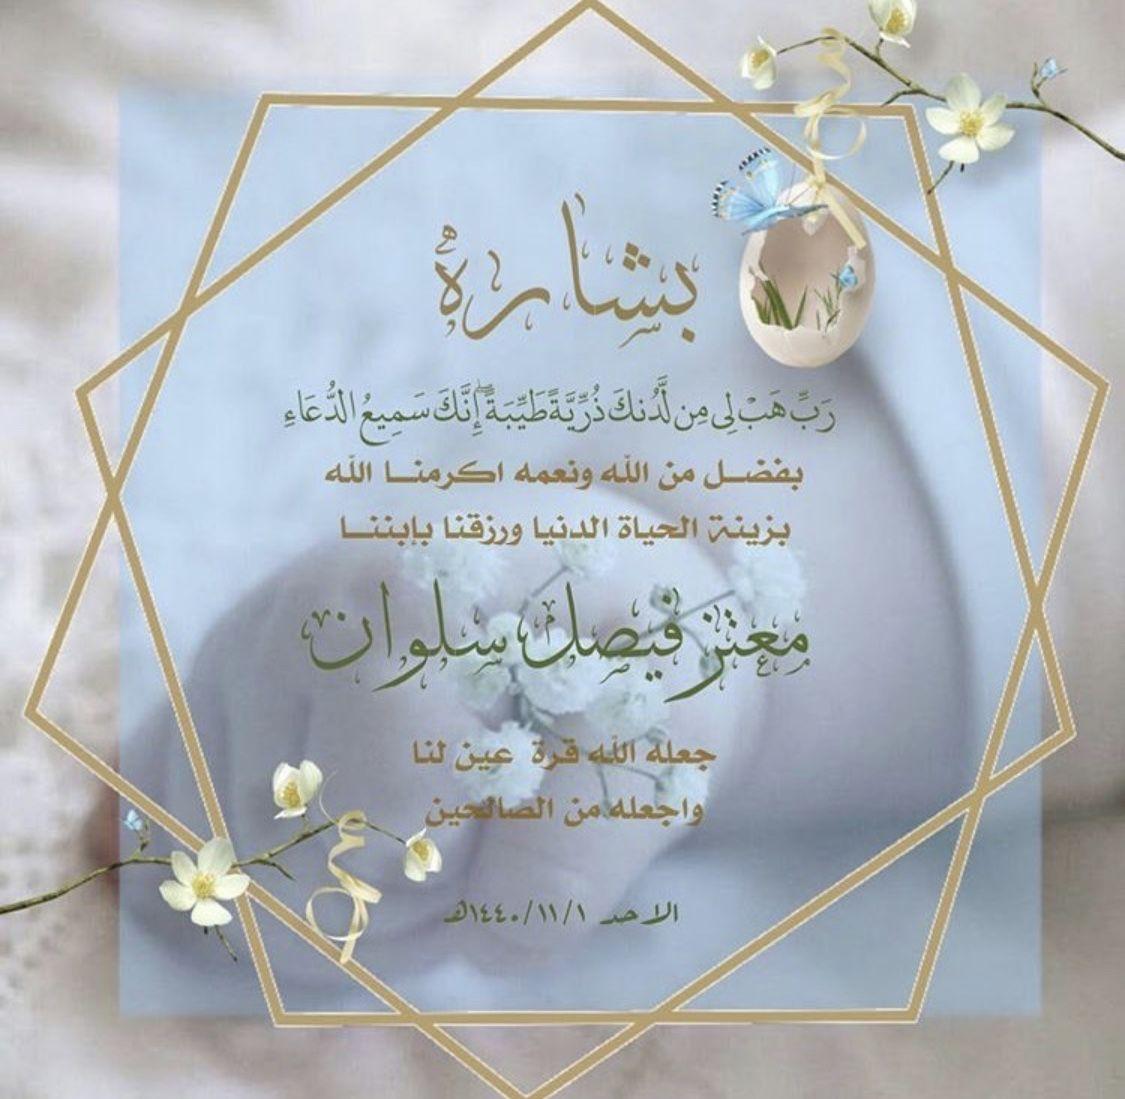 Pin By Mawadh On بيبي Valentine Wedding Card Baby Boy Cards Wedding Invitation Card Design